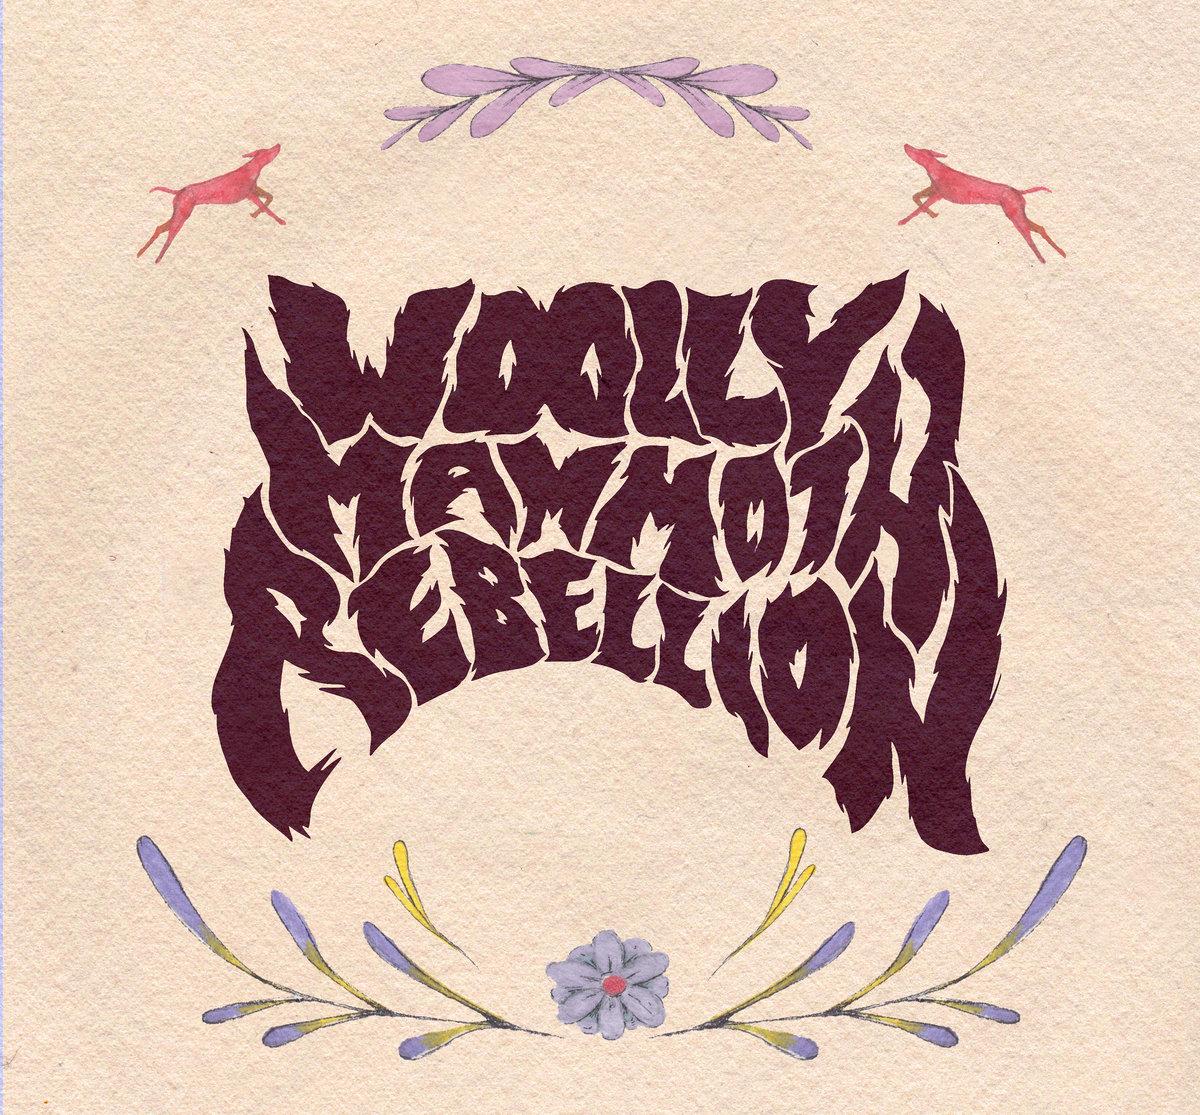 Woolly Mammoth Rebellion - Glint Gales